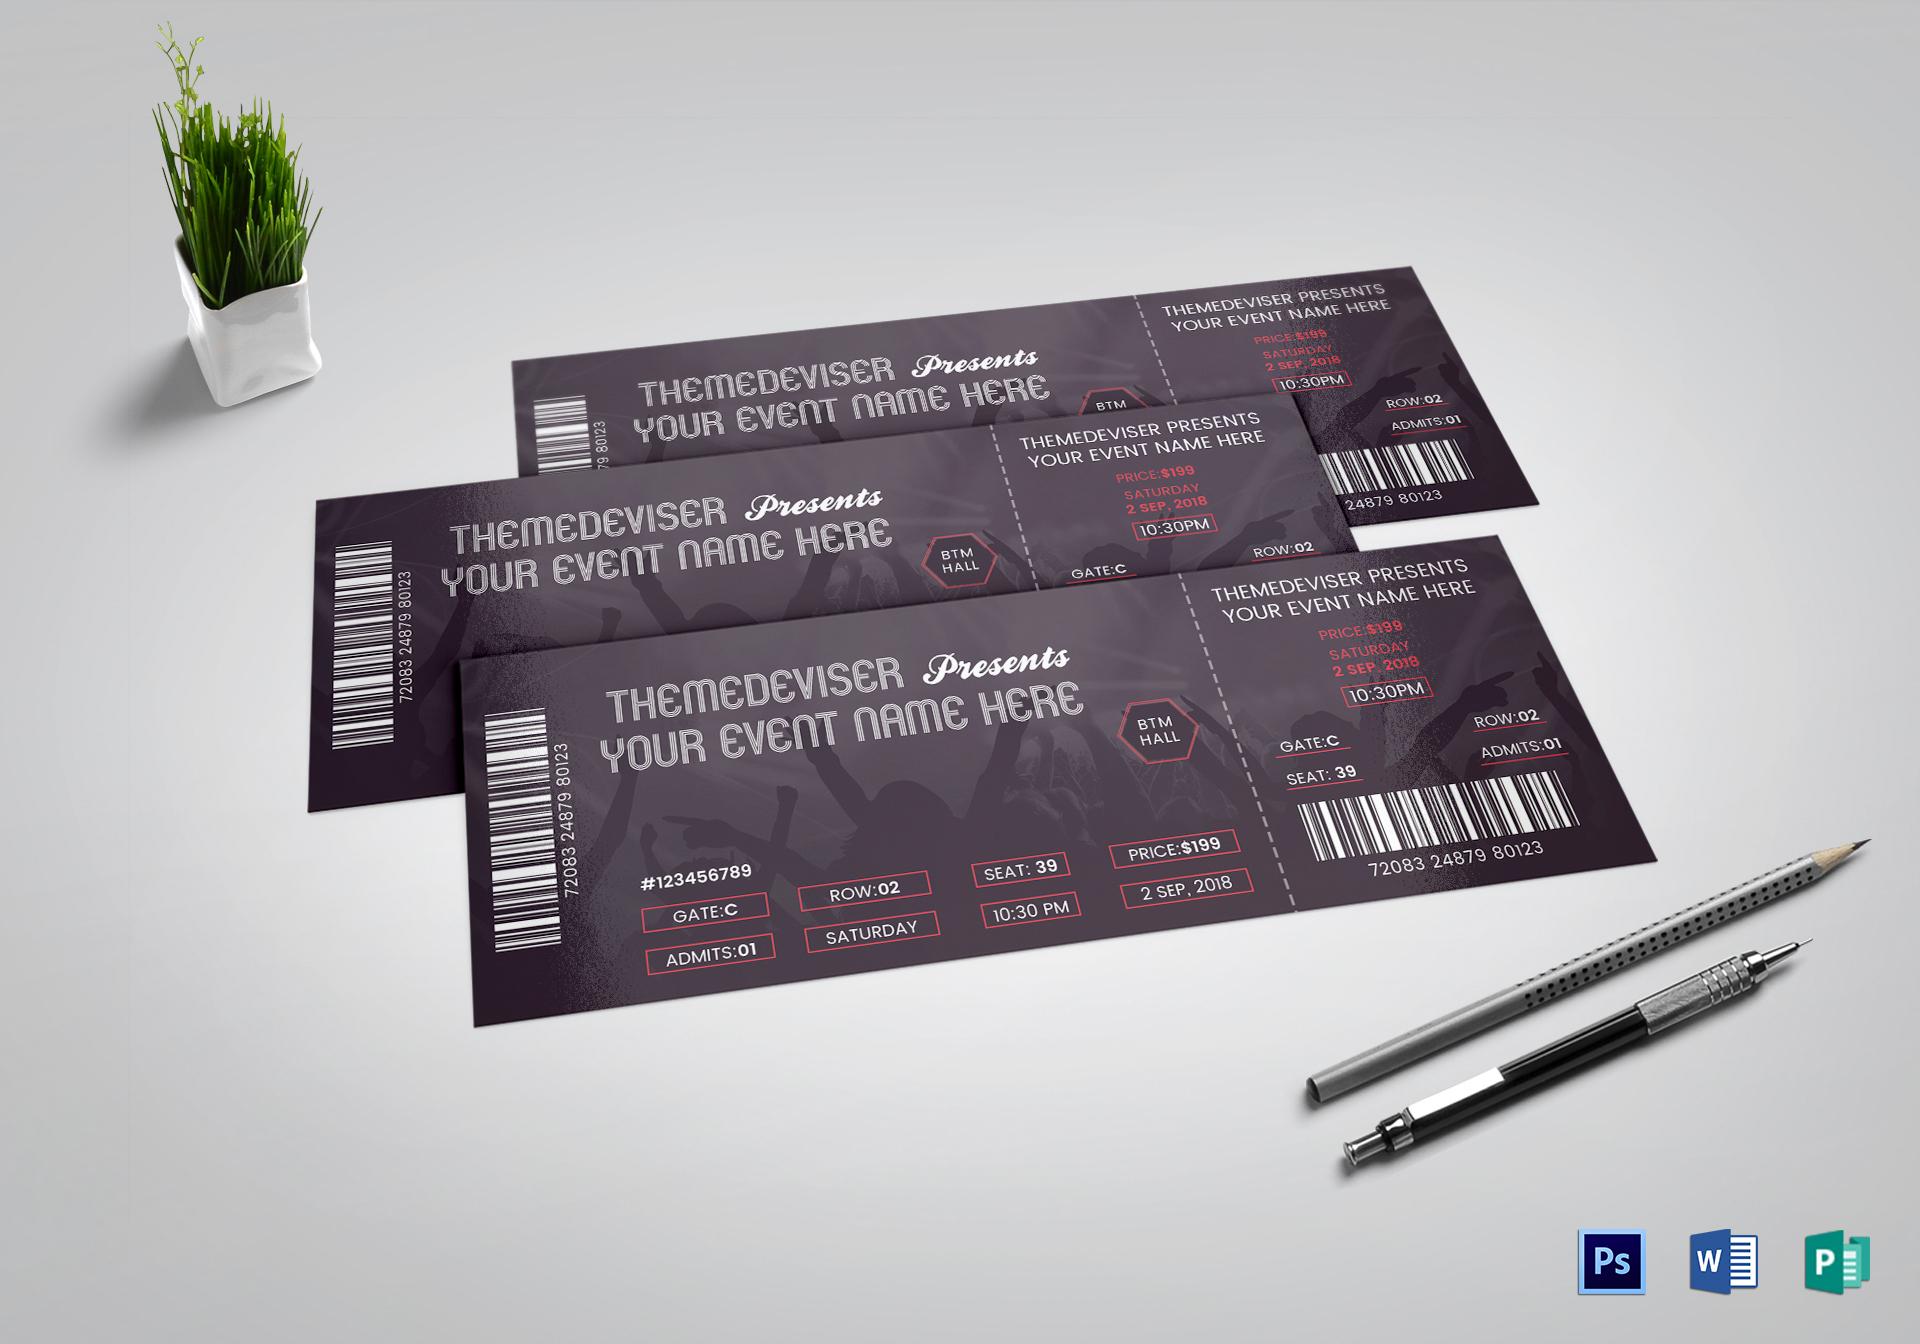 Sample Concert Ticket Template